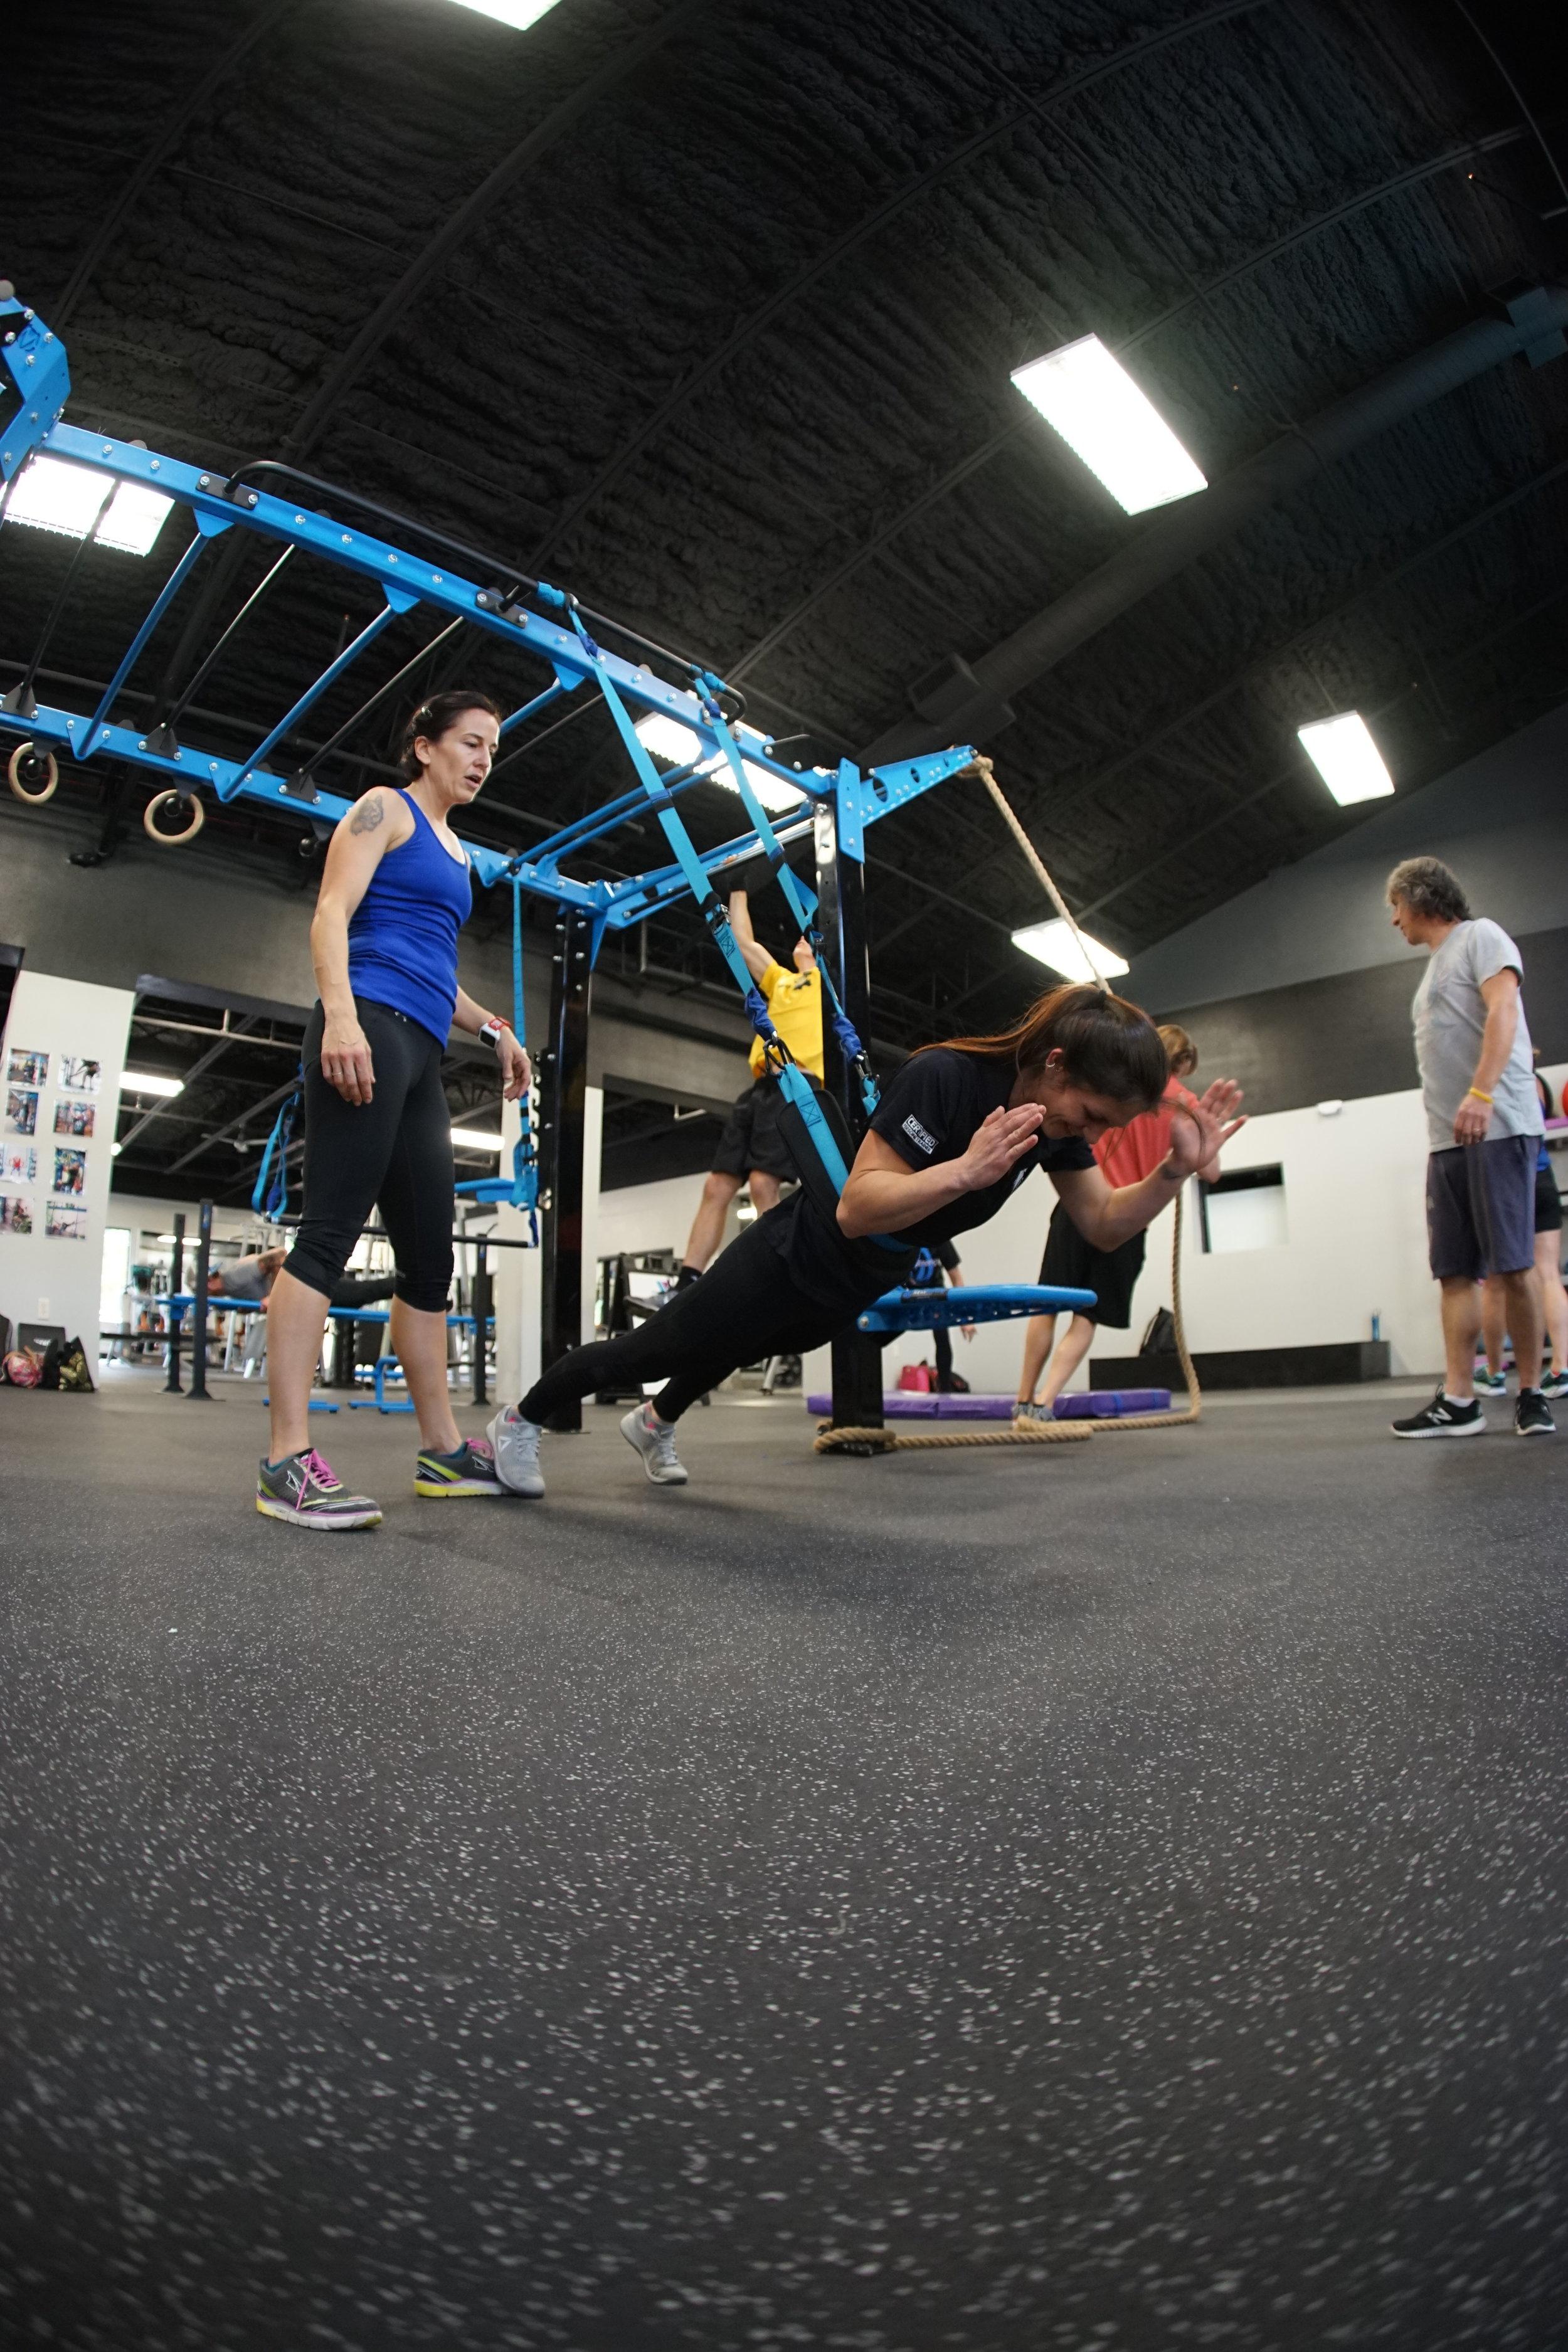 Elevate Trainer exercise